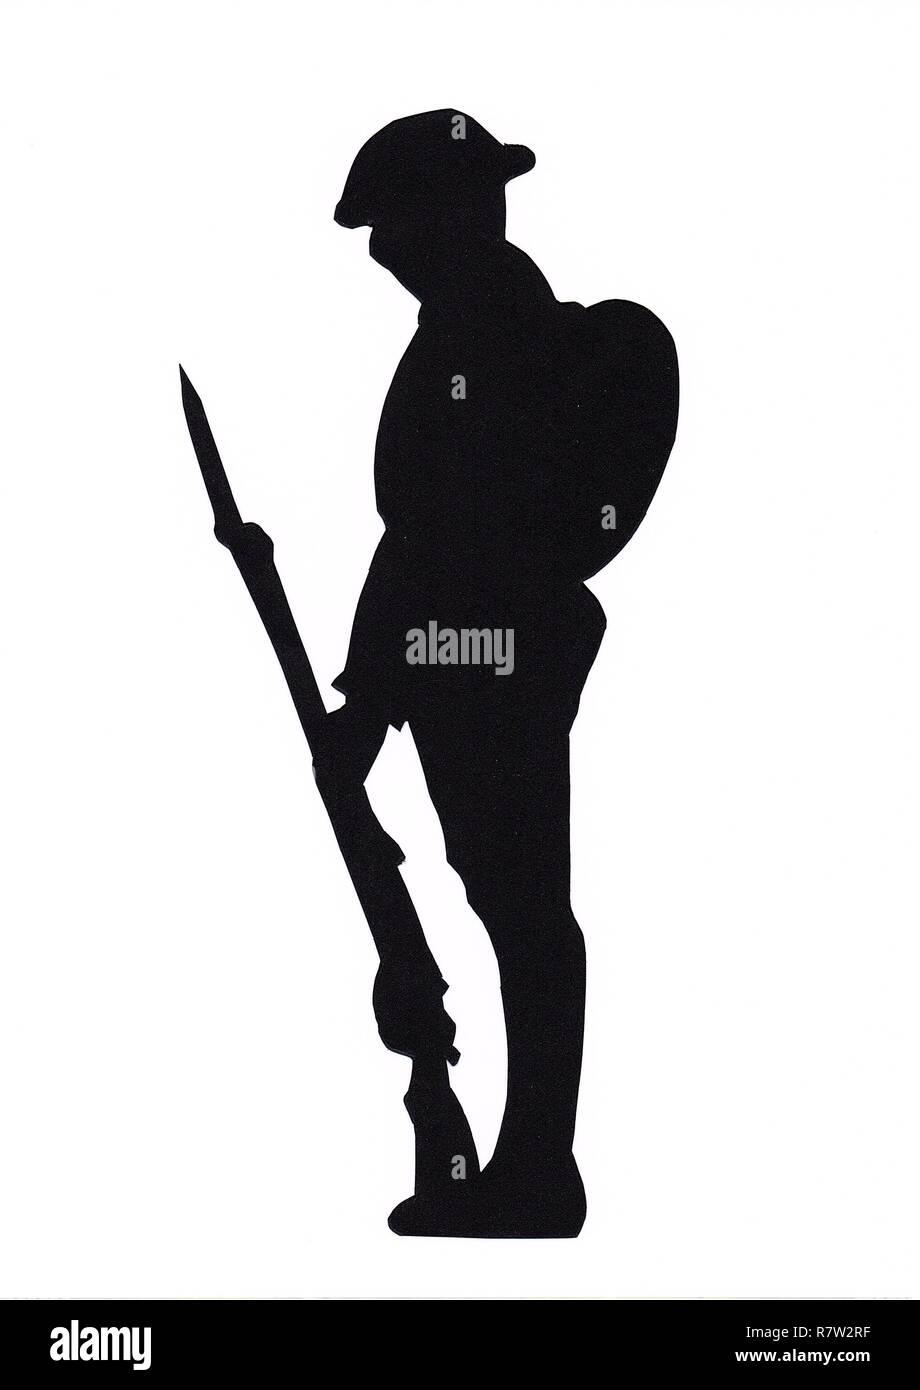 British Soldier And Silhouette Stock Photos & British ...